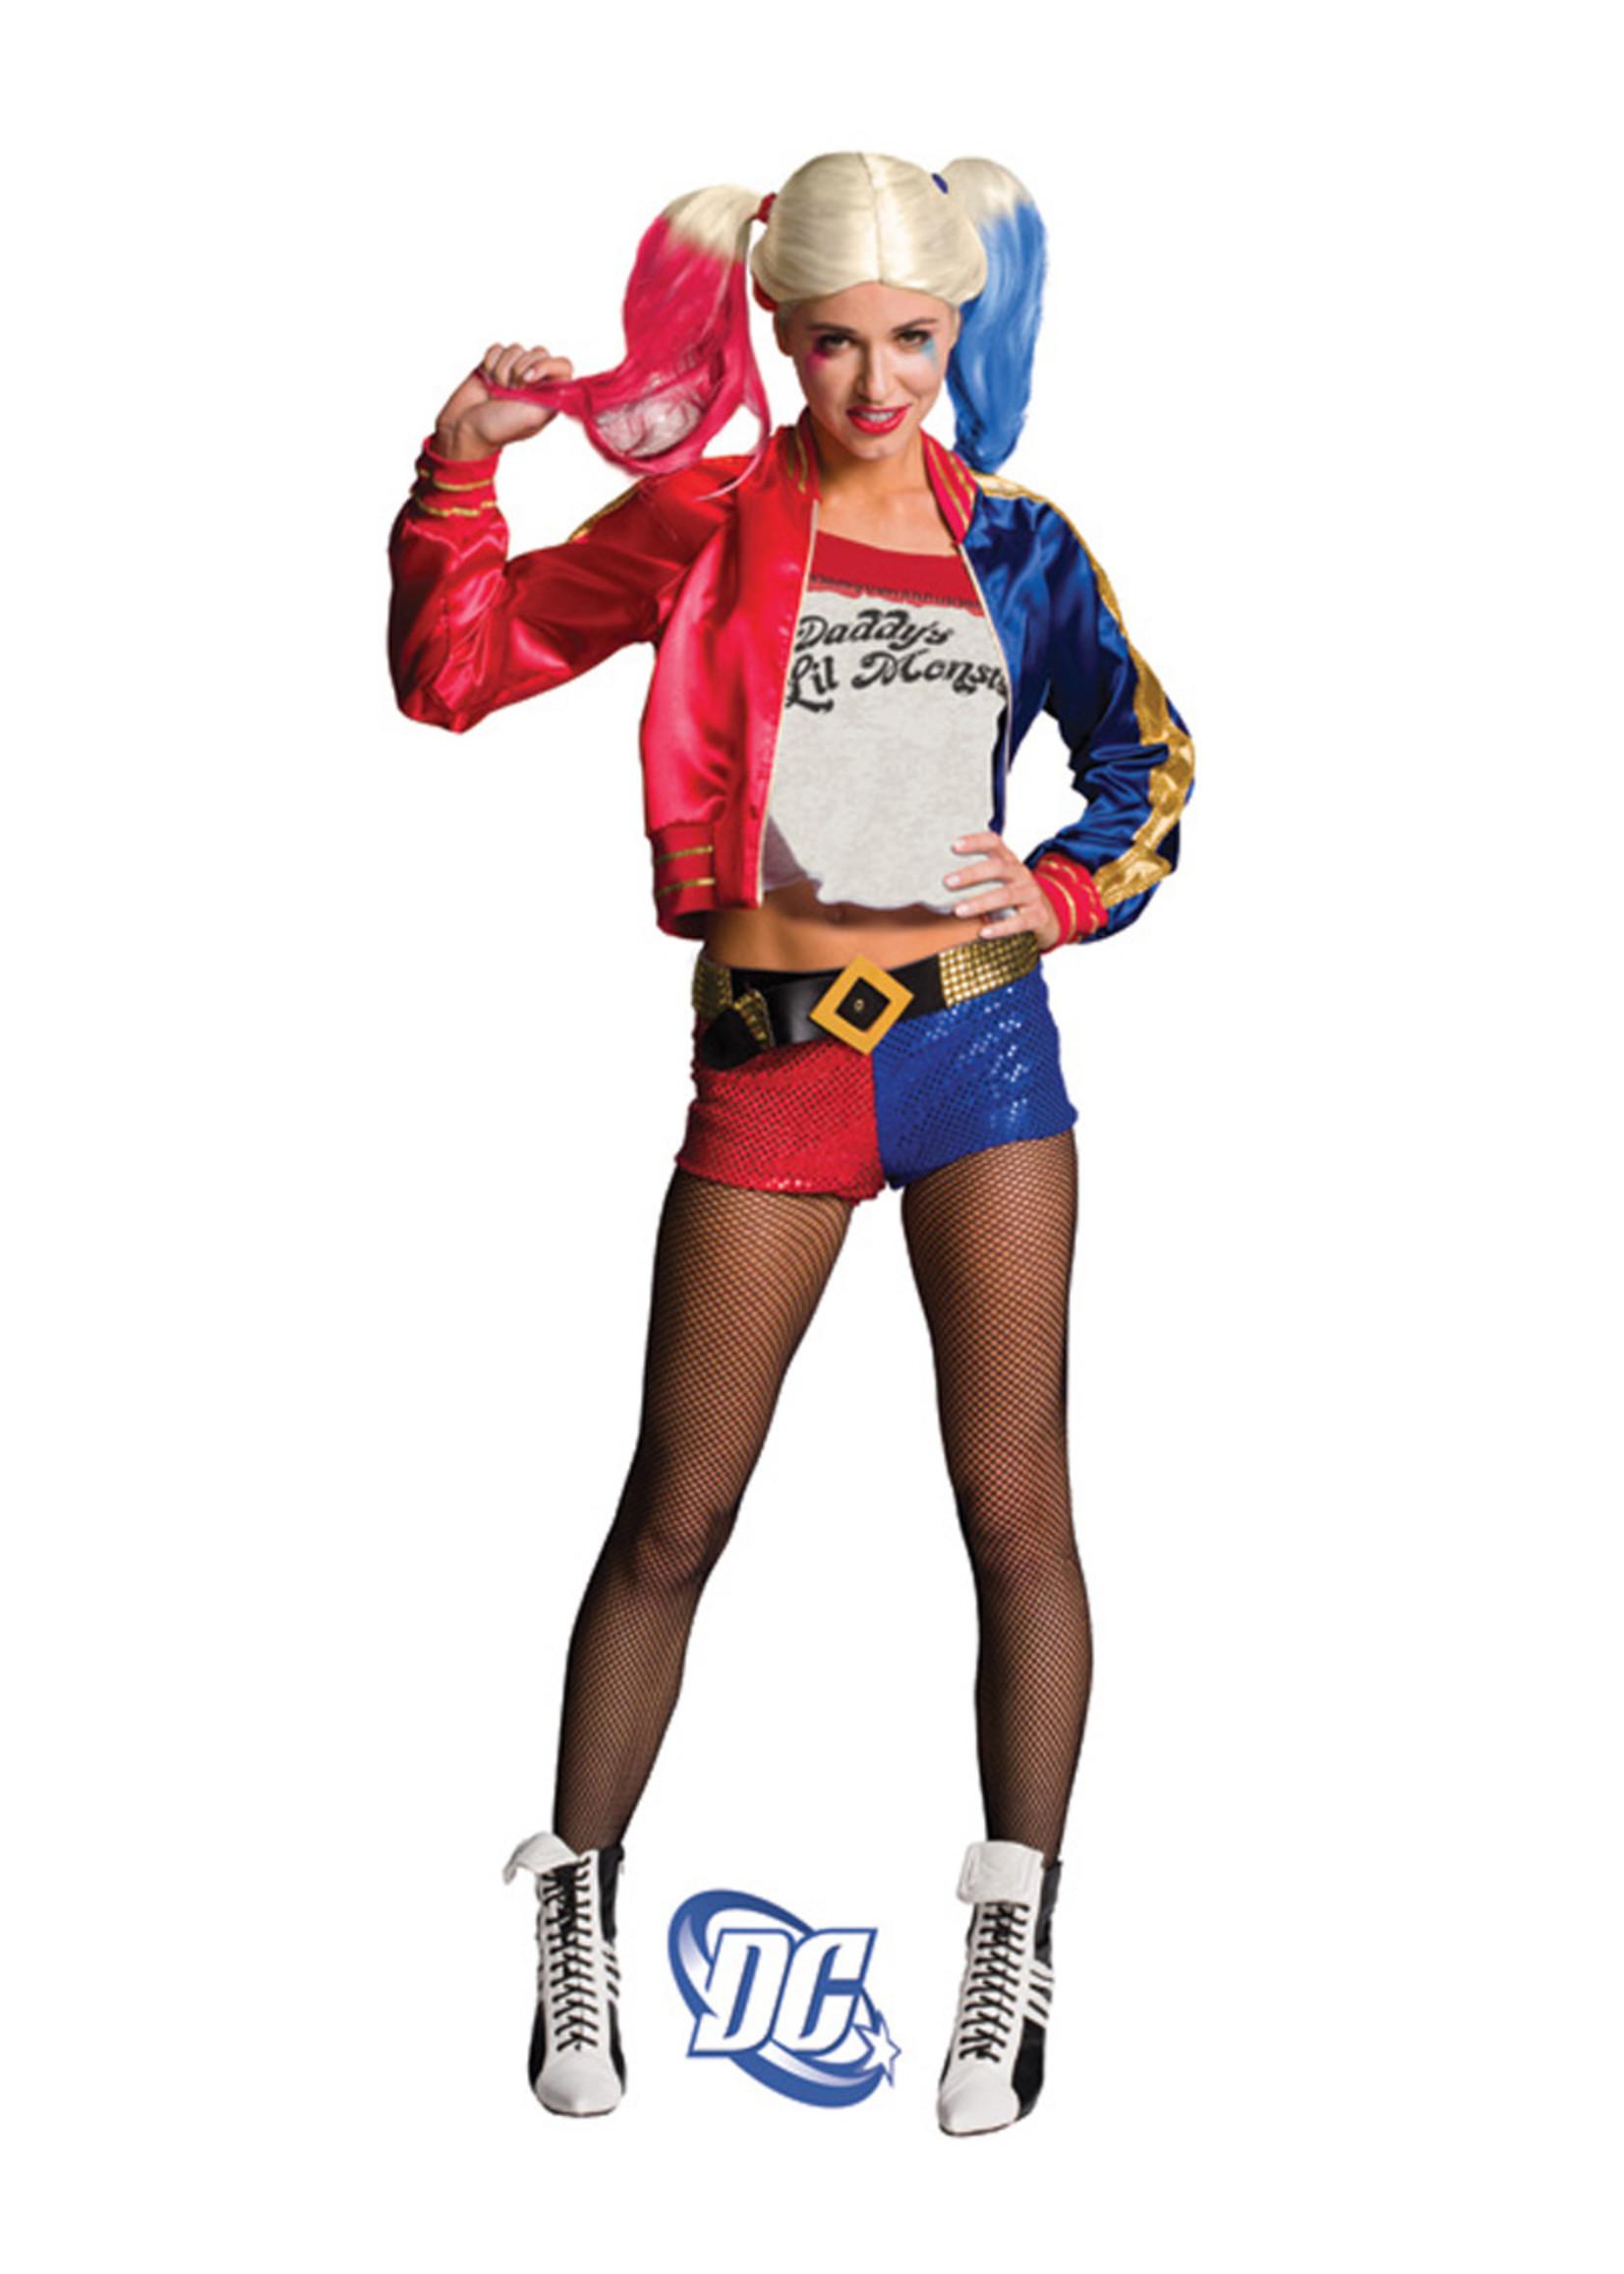 RUBIES Harley Quinn Deluxe Costume - Women's